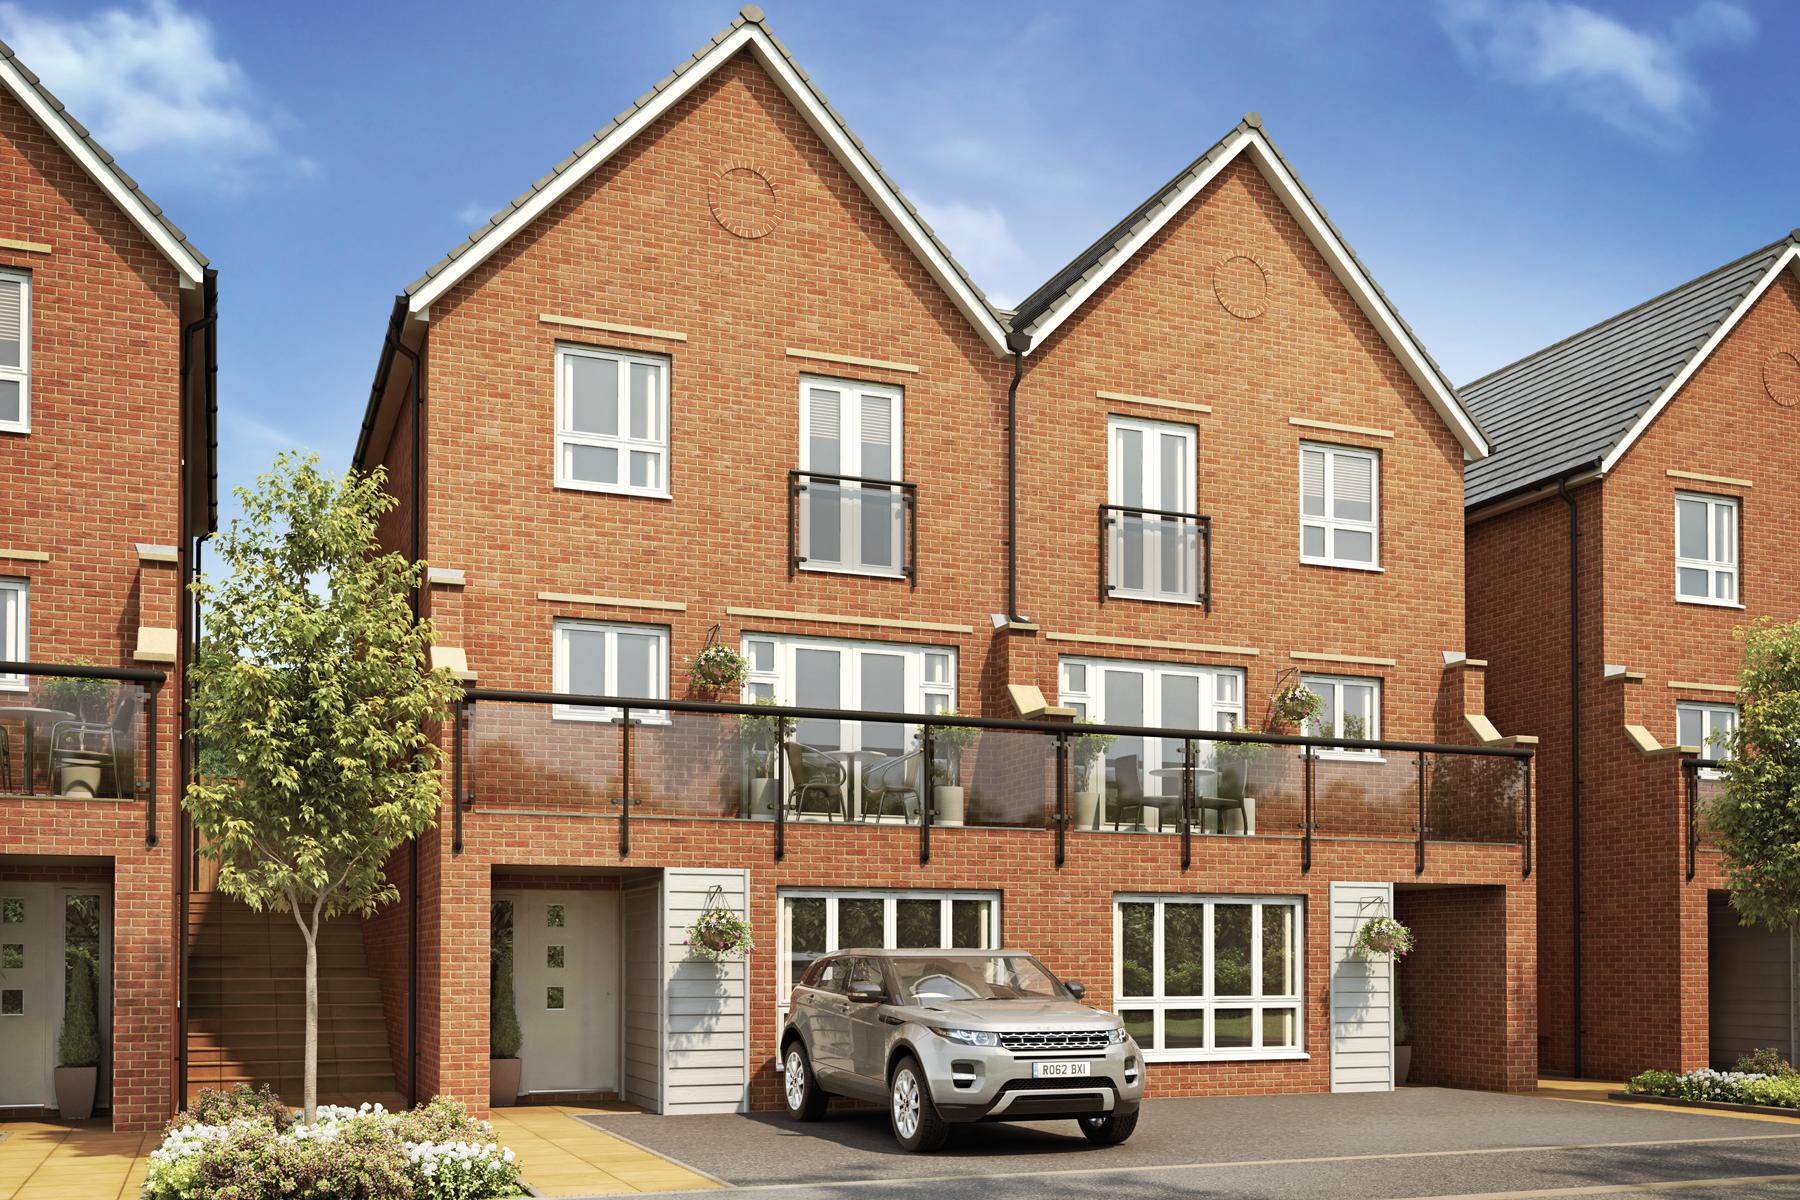 New Homes In Folkestone